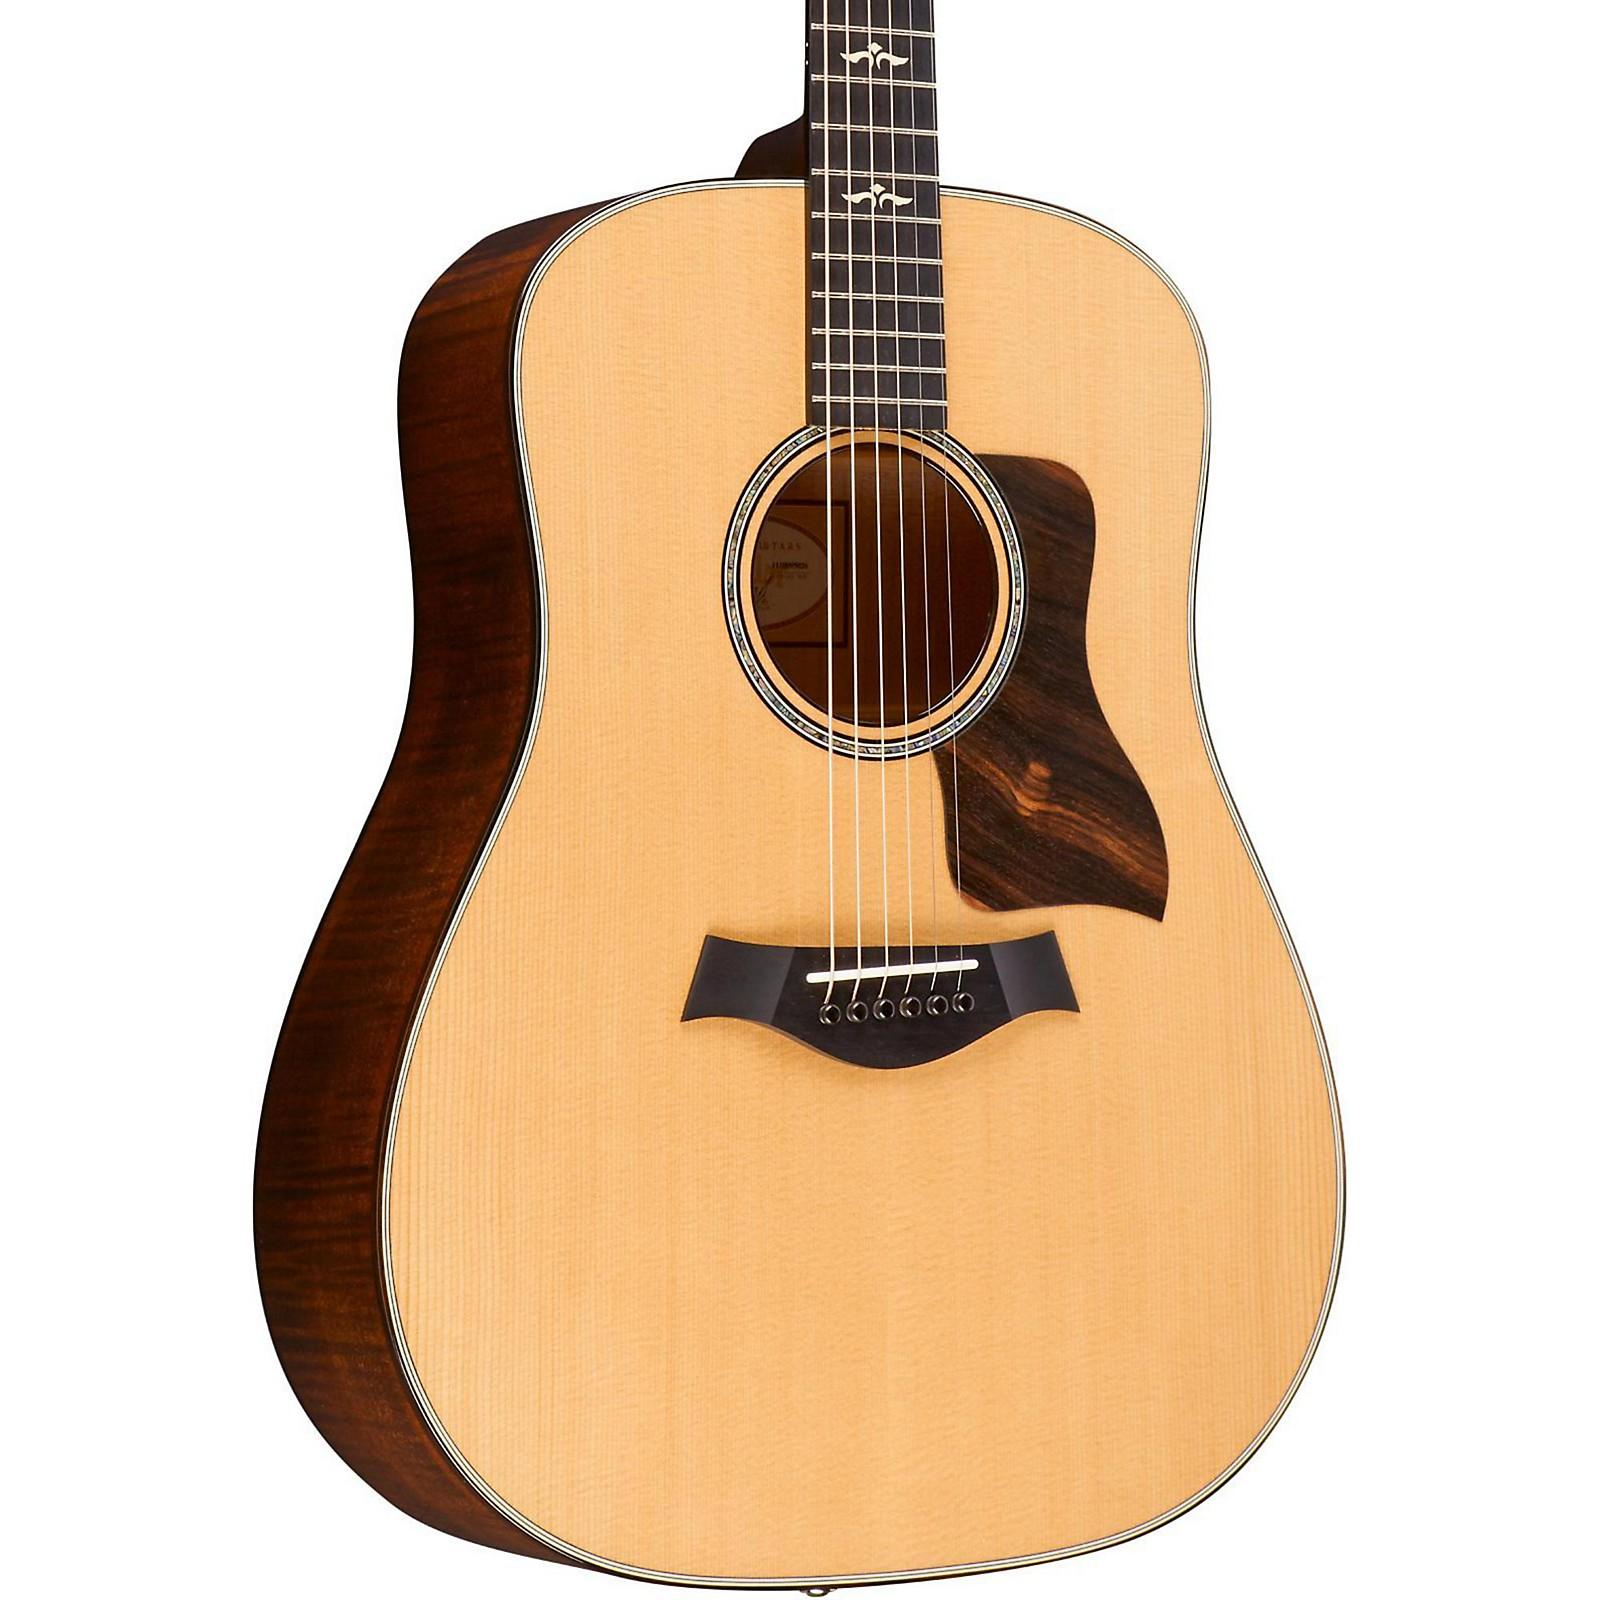 Taylor 610 Dreadnought Acoustic Guitar